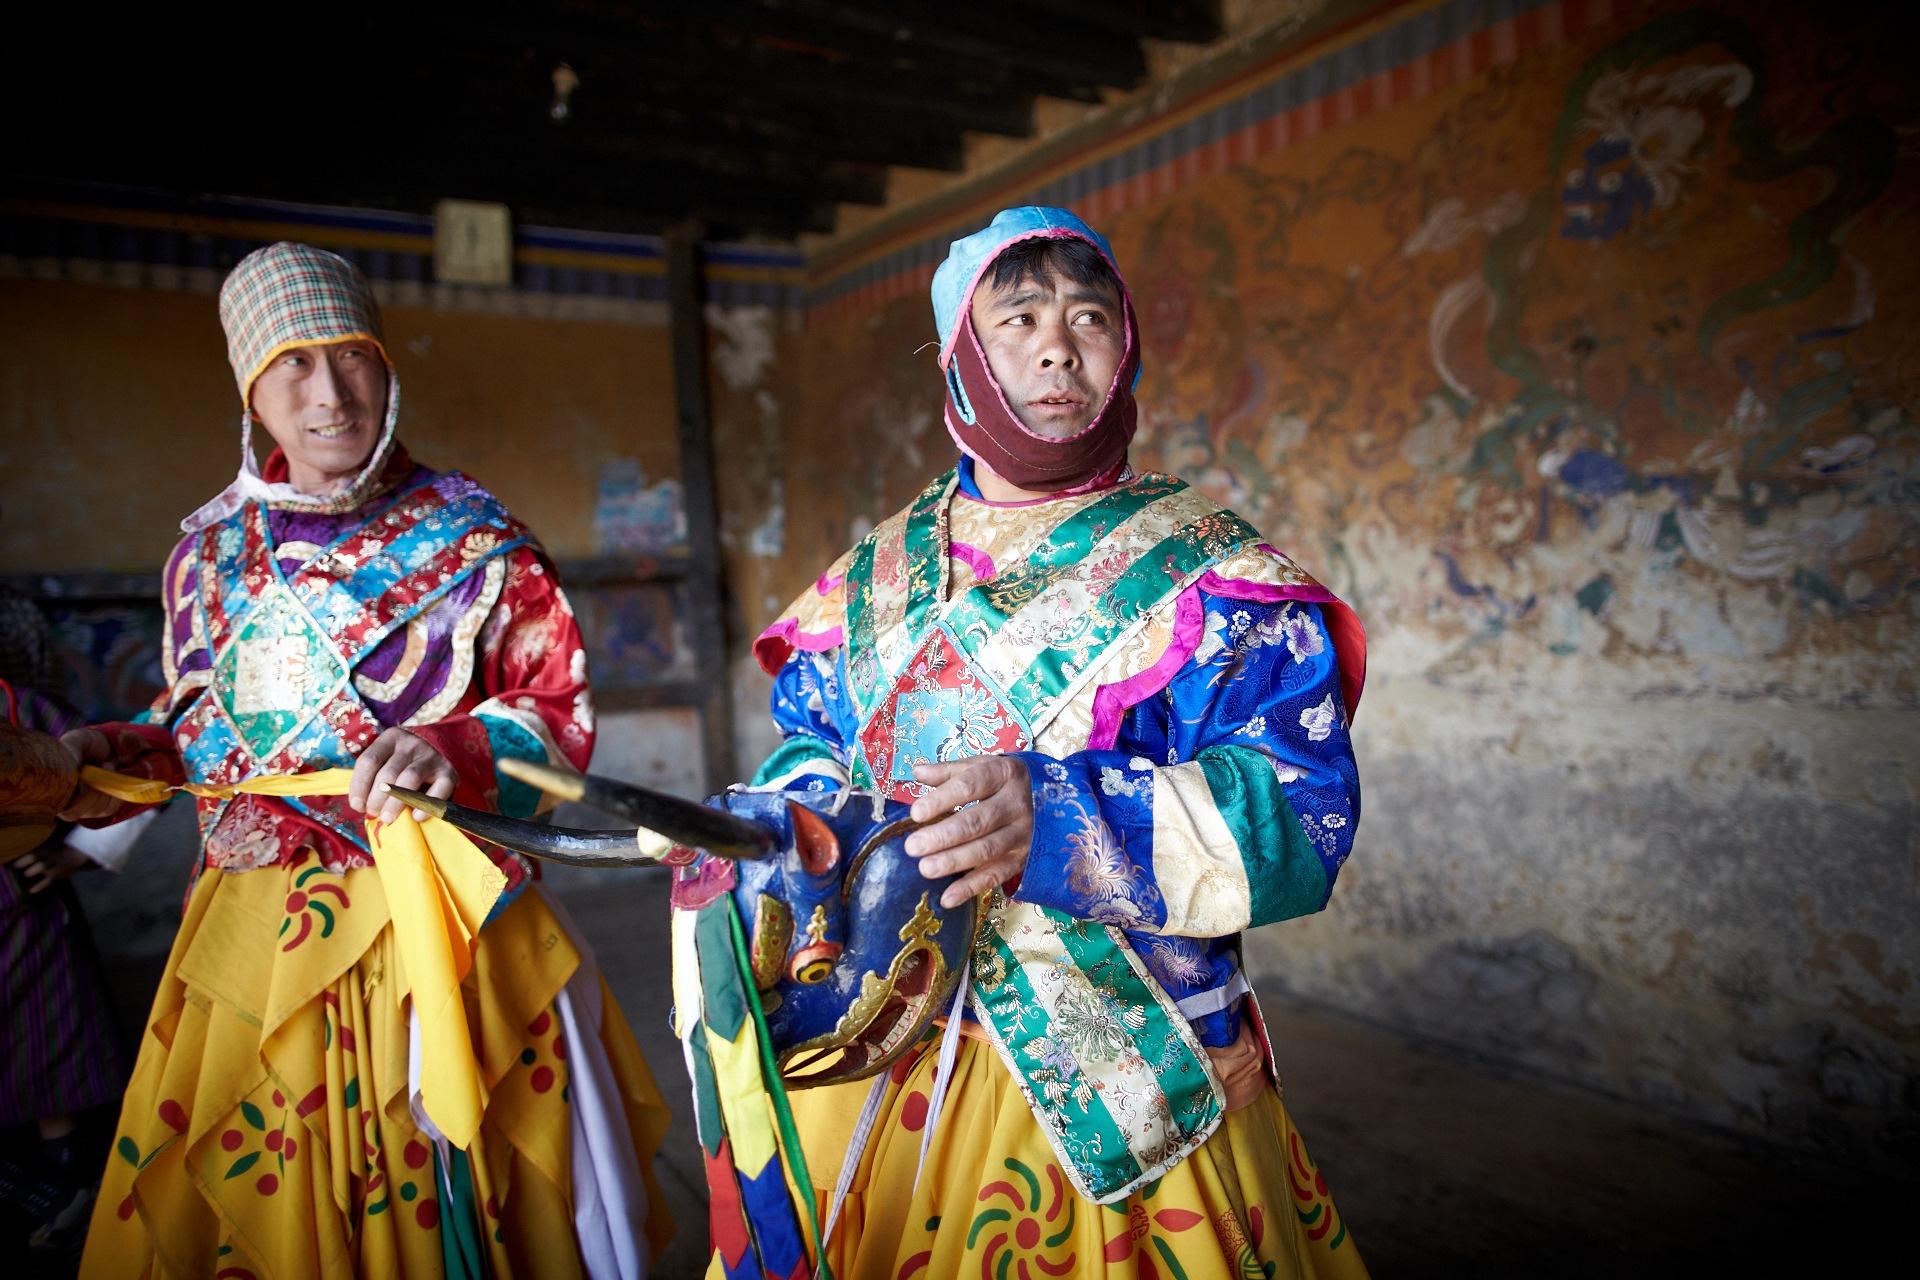 Inconspicuous in Bhutan